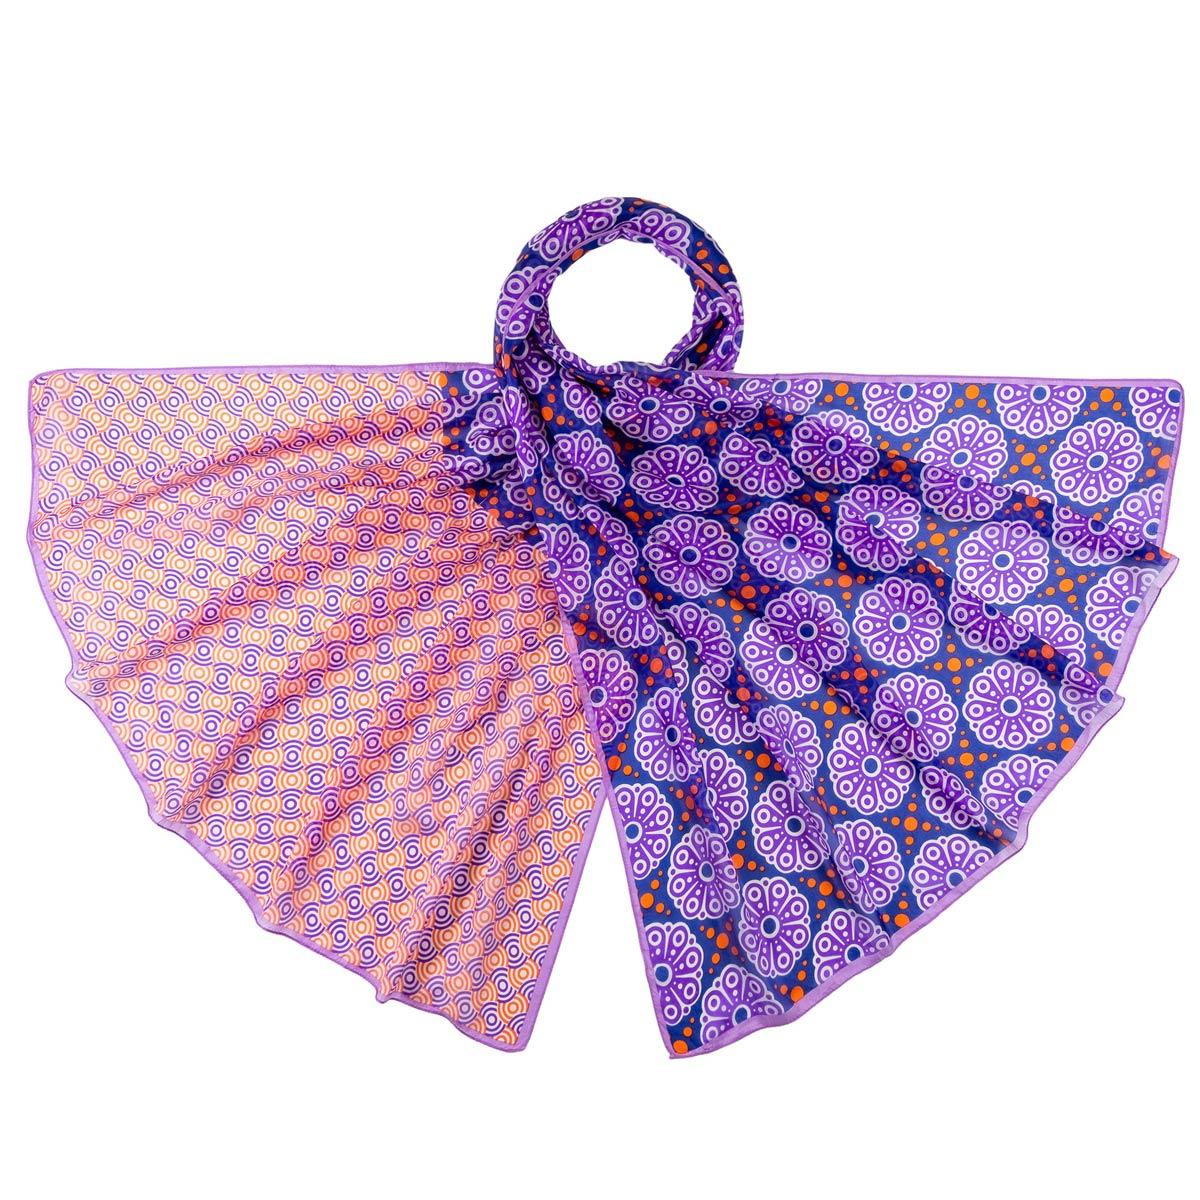 AT-06356-F12-etole-soie-fine-violette-rose